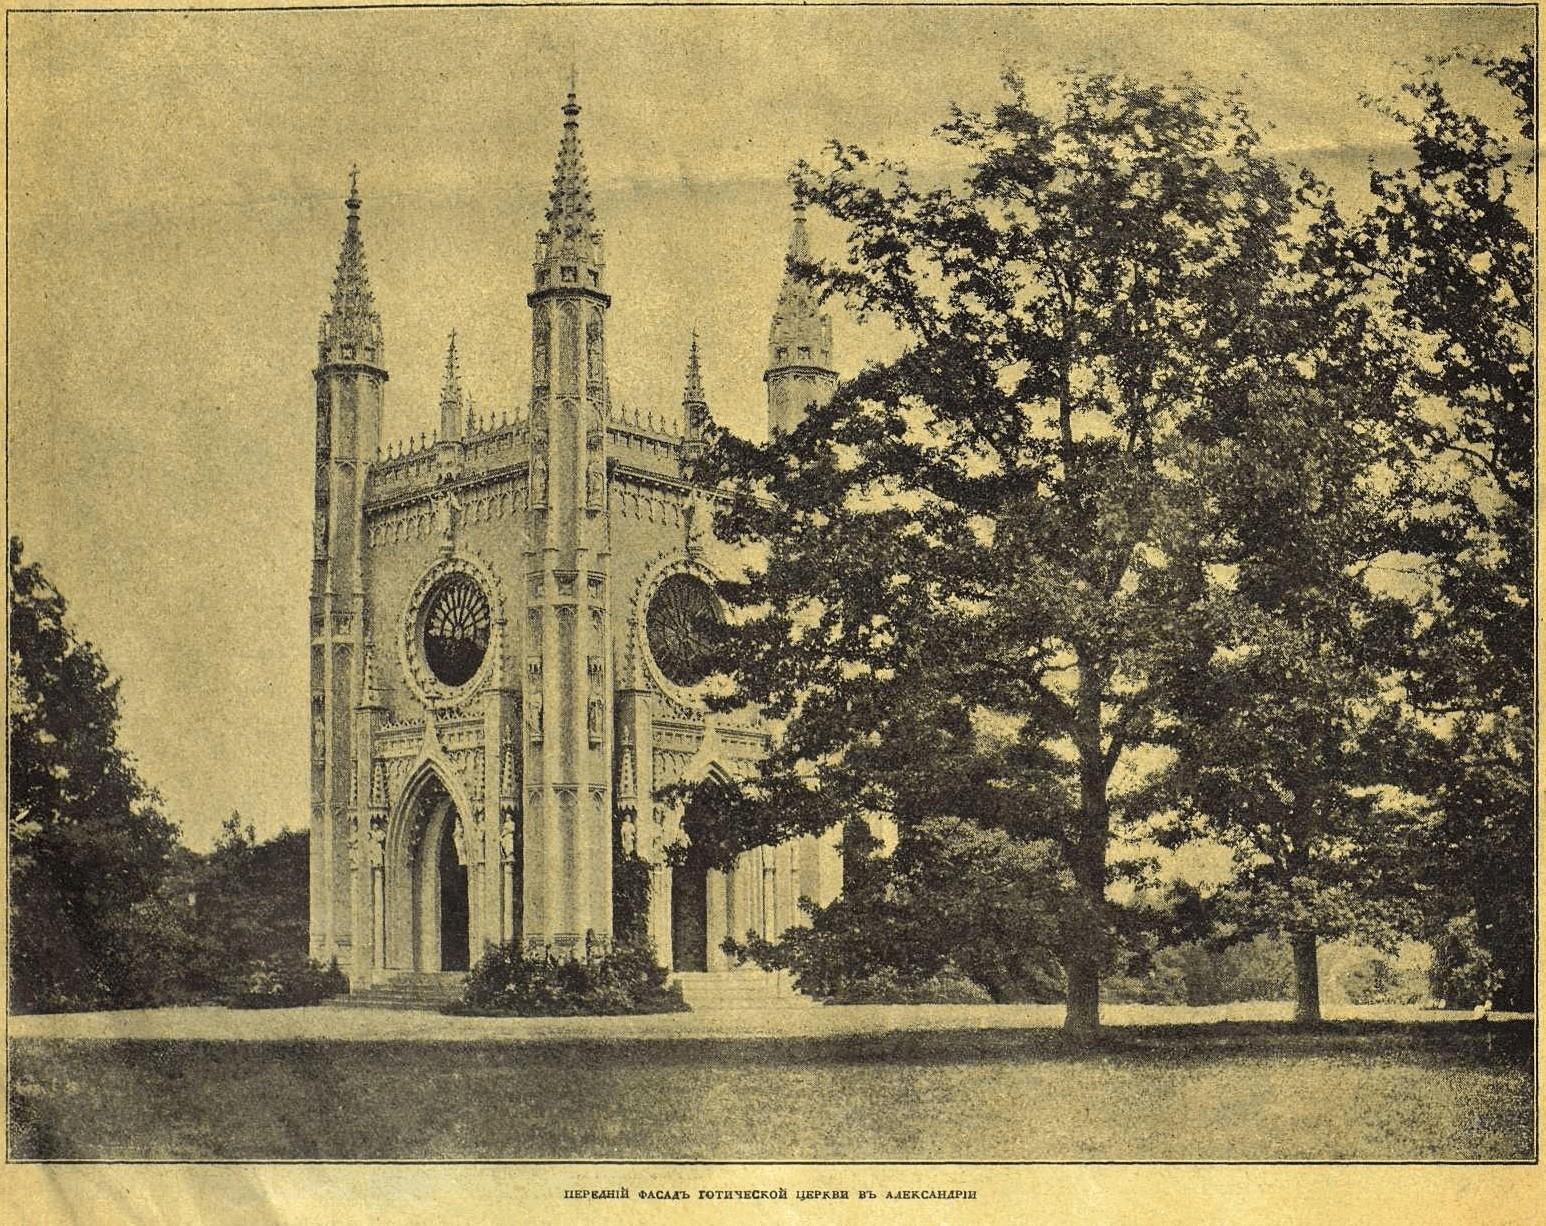 Передний фасад Готической церкви